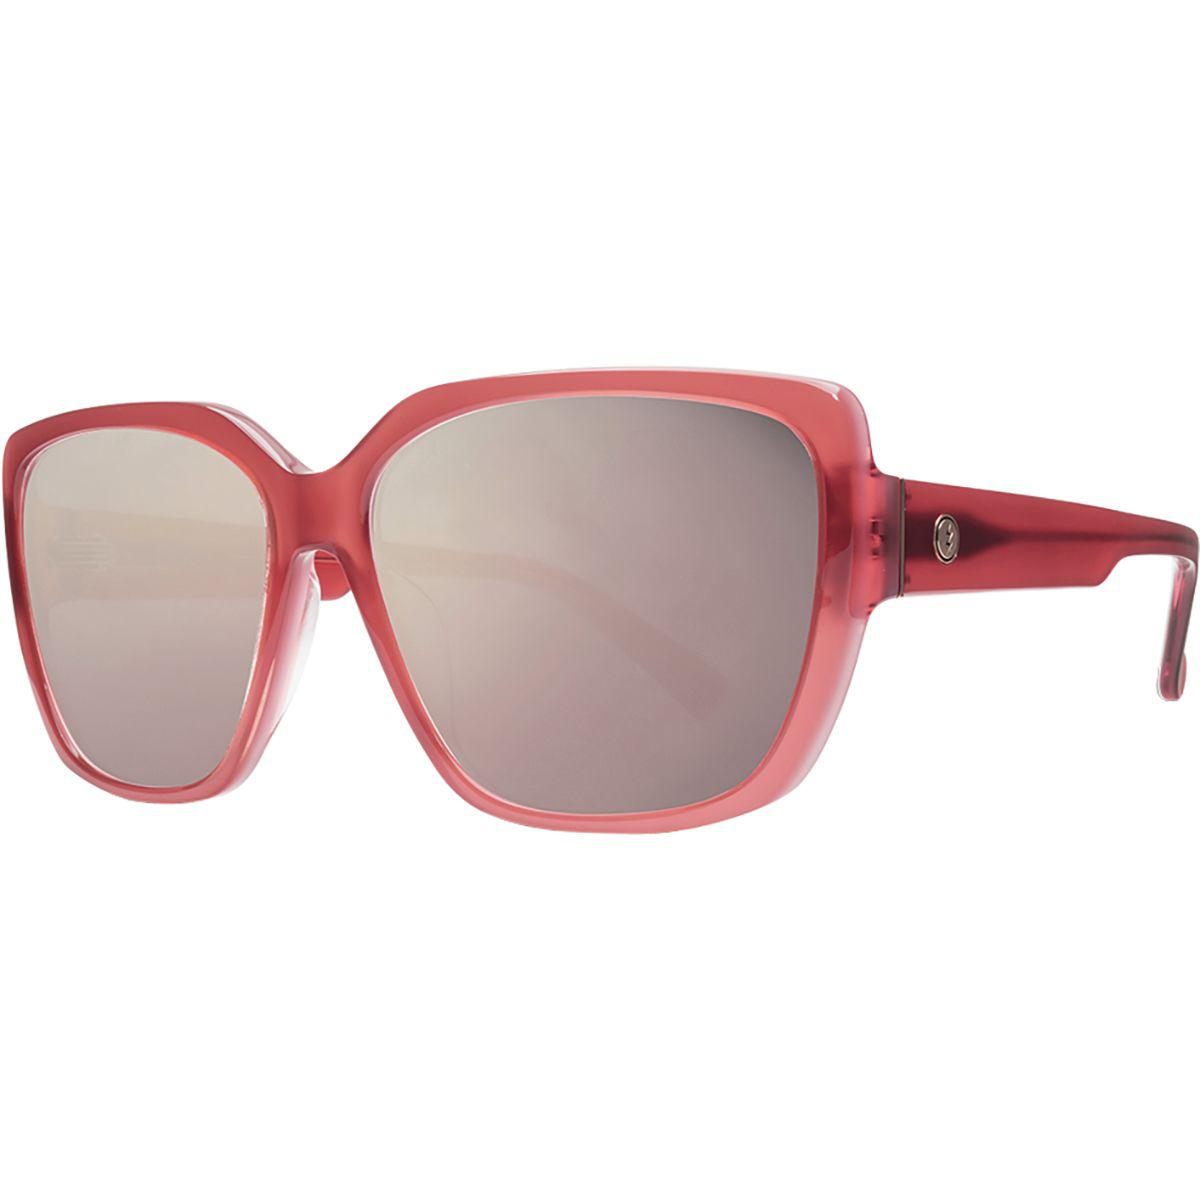 c42076c4b05 Lyst - Electric Honey Bee Sunglasses in Pink